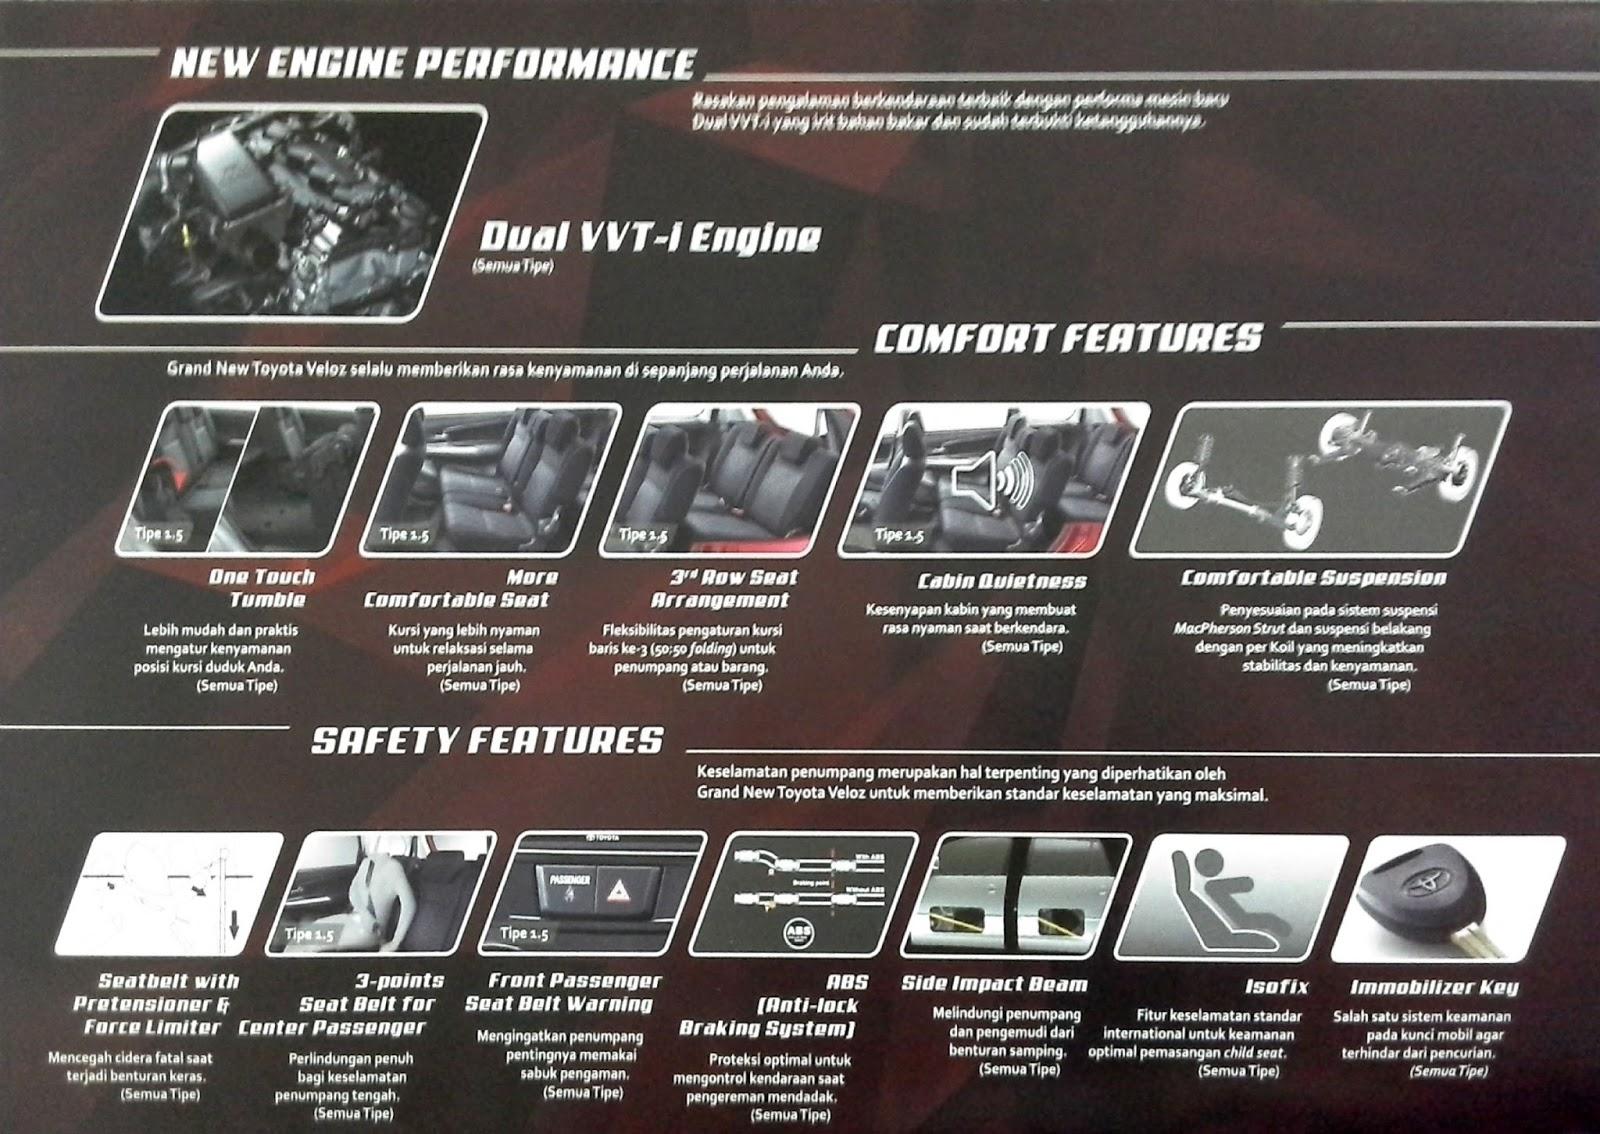 Perbedaan Grand New Avanza Veloz 1.3 Dan 1.5 Diecast Jual Beli Harga Toyota Jakarta